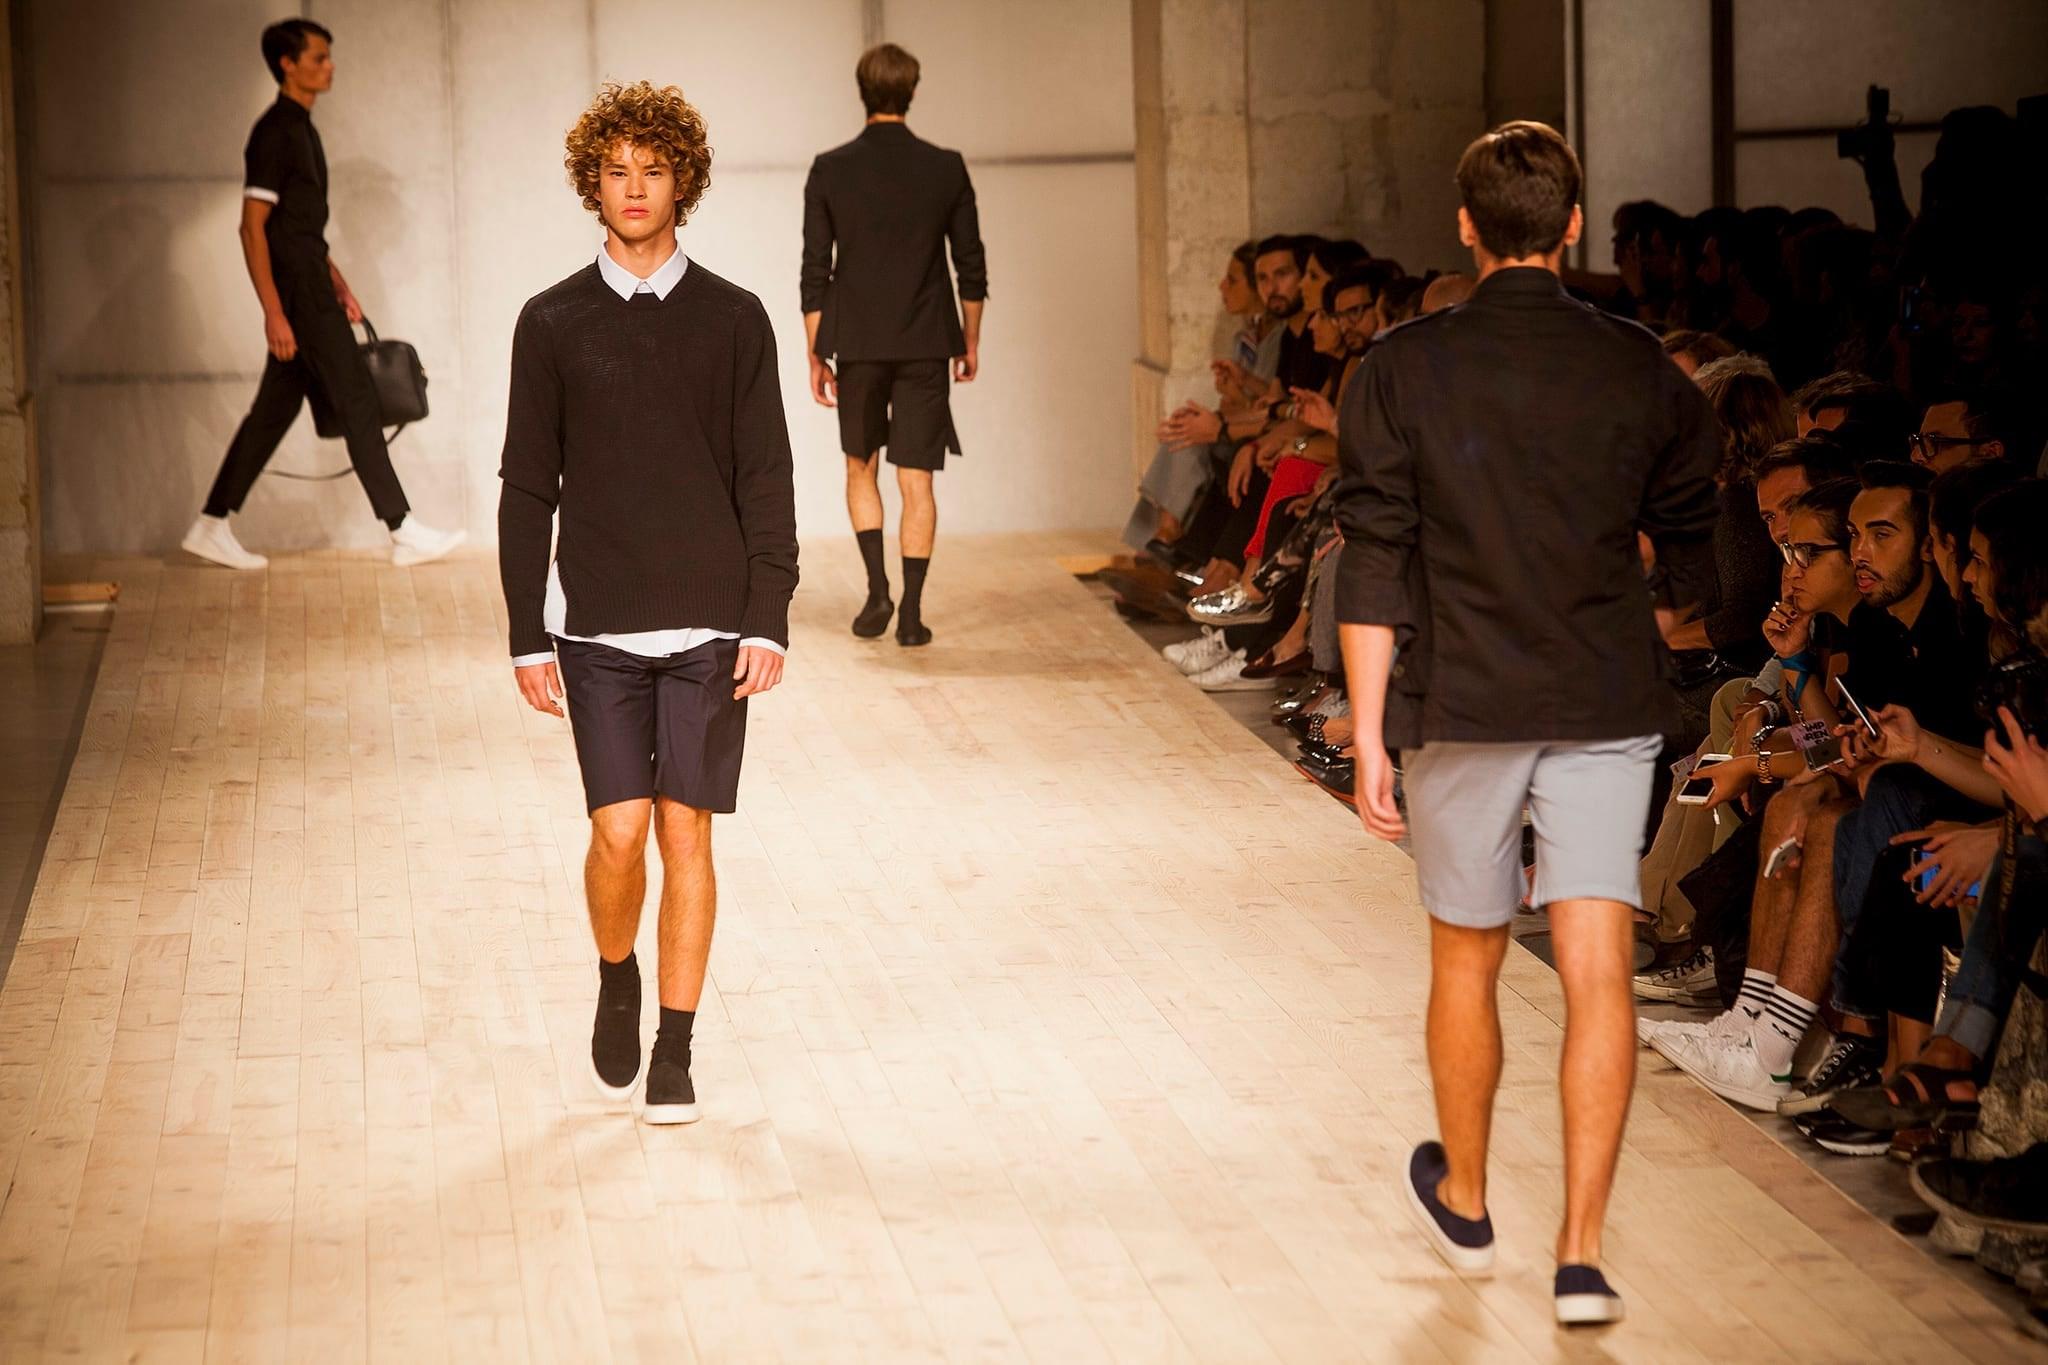 O sportswear entra para o aquecimento da 47.ª ModaLisboa